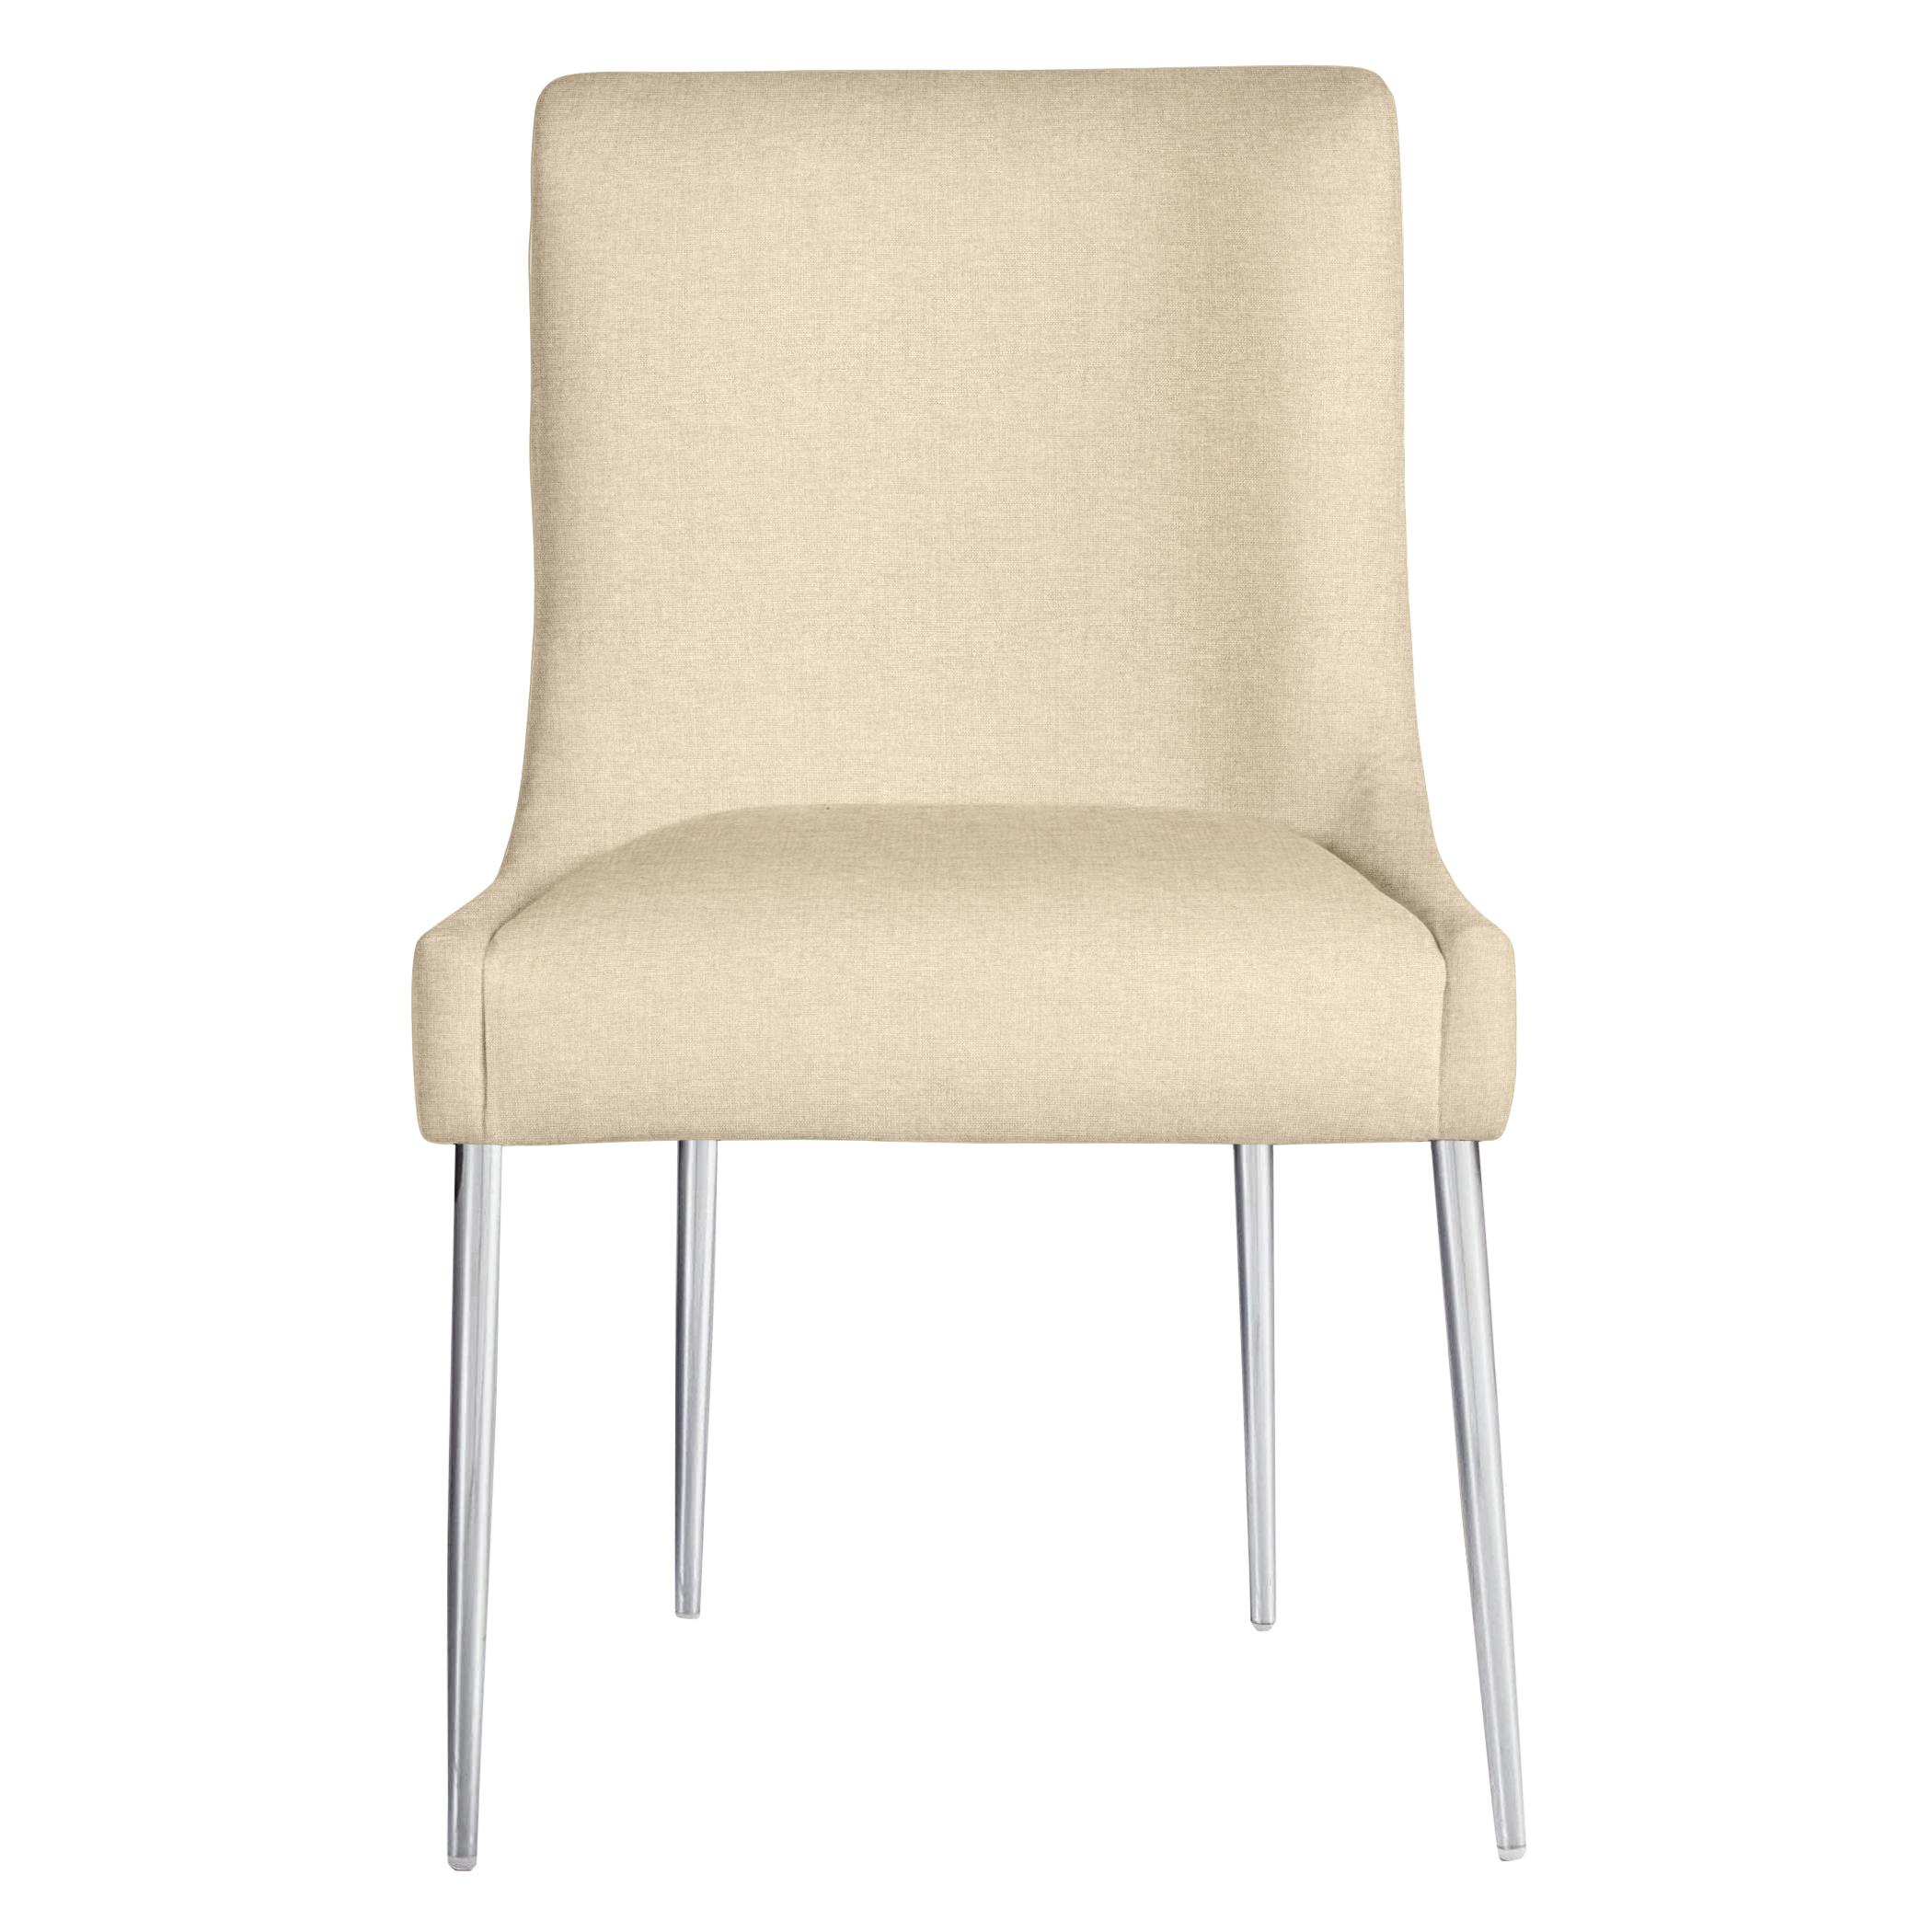 Elinor Dining Chair - Bright Nickel